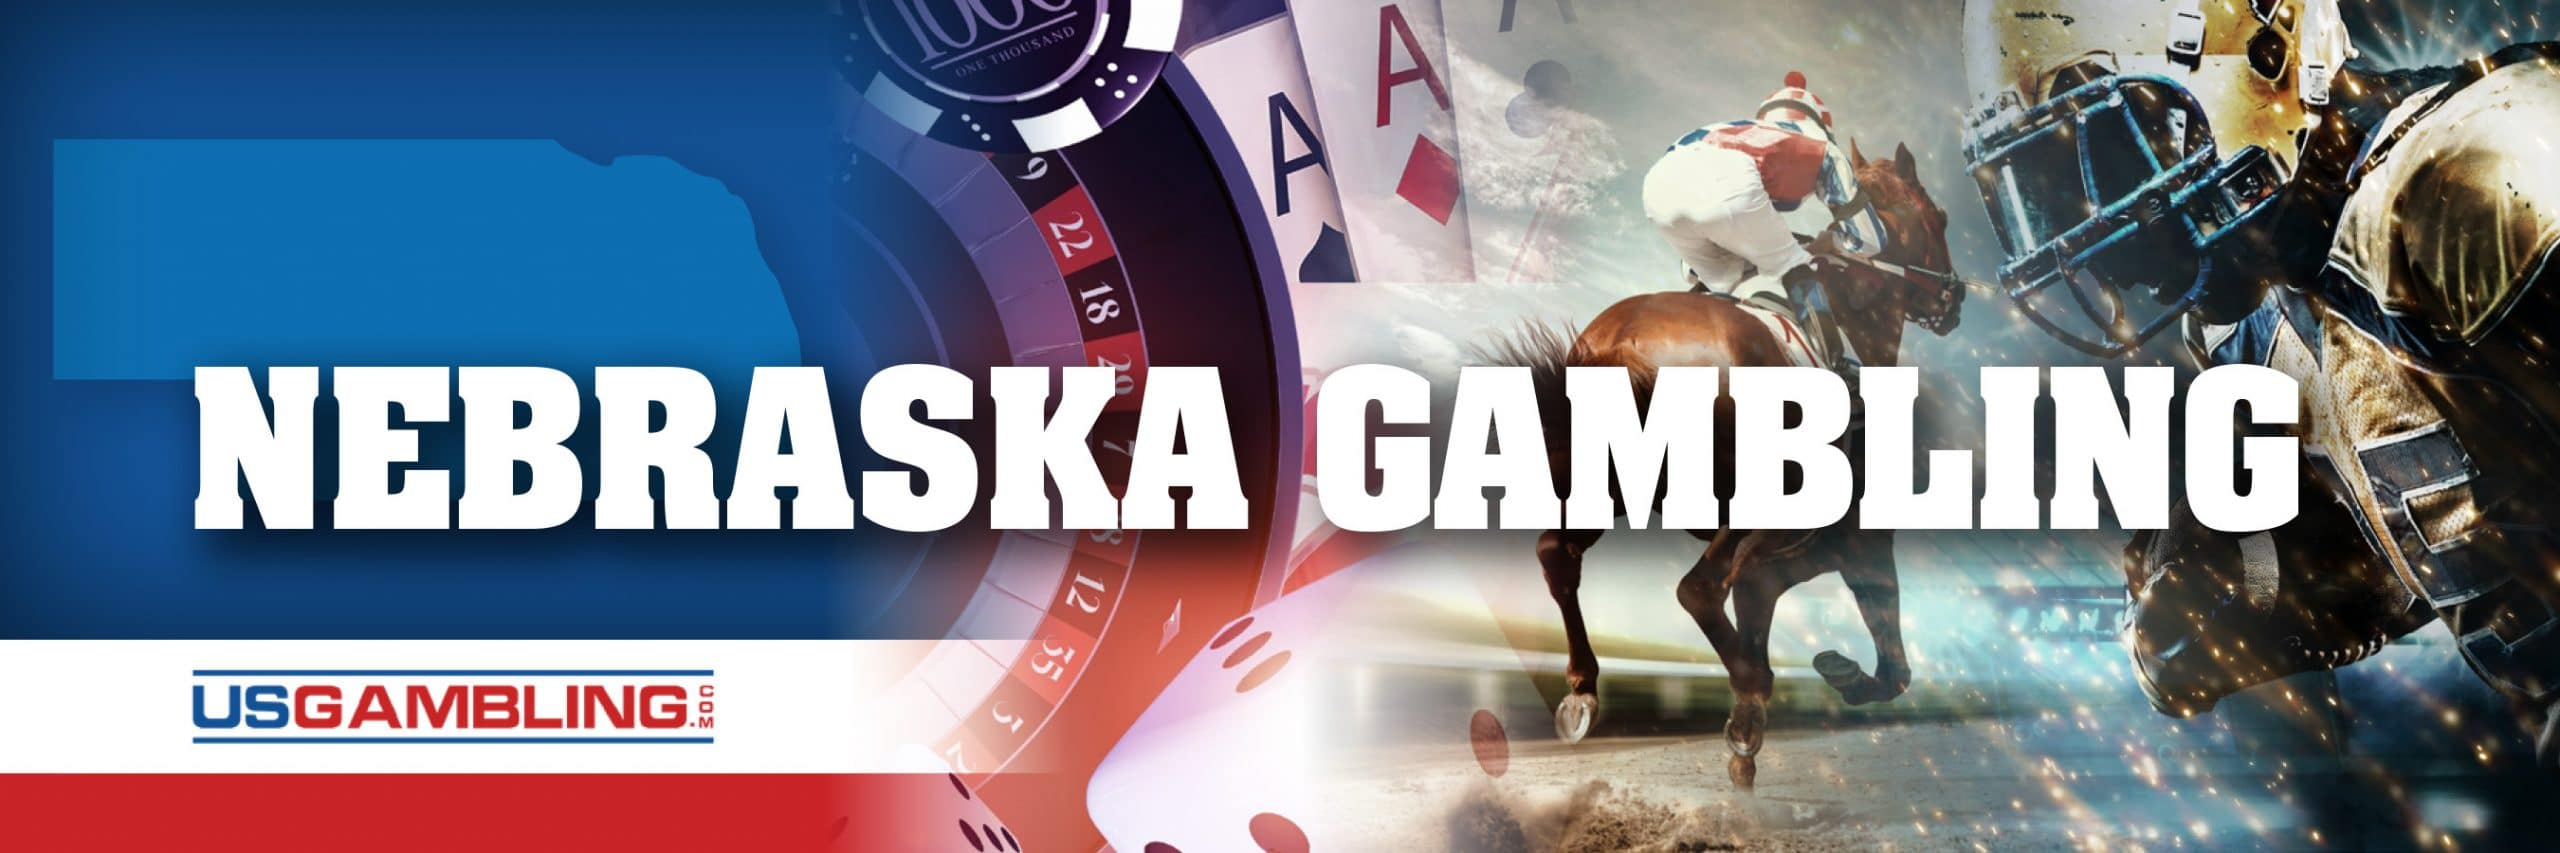 Legal Nebraska Gambling